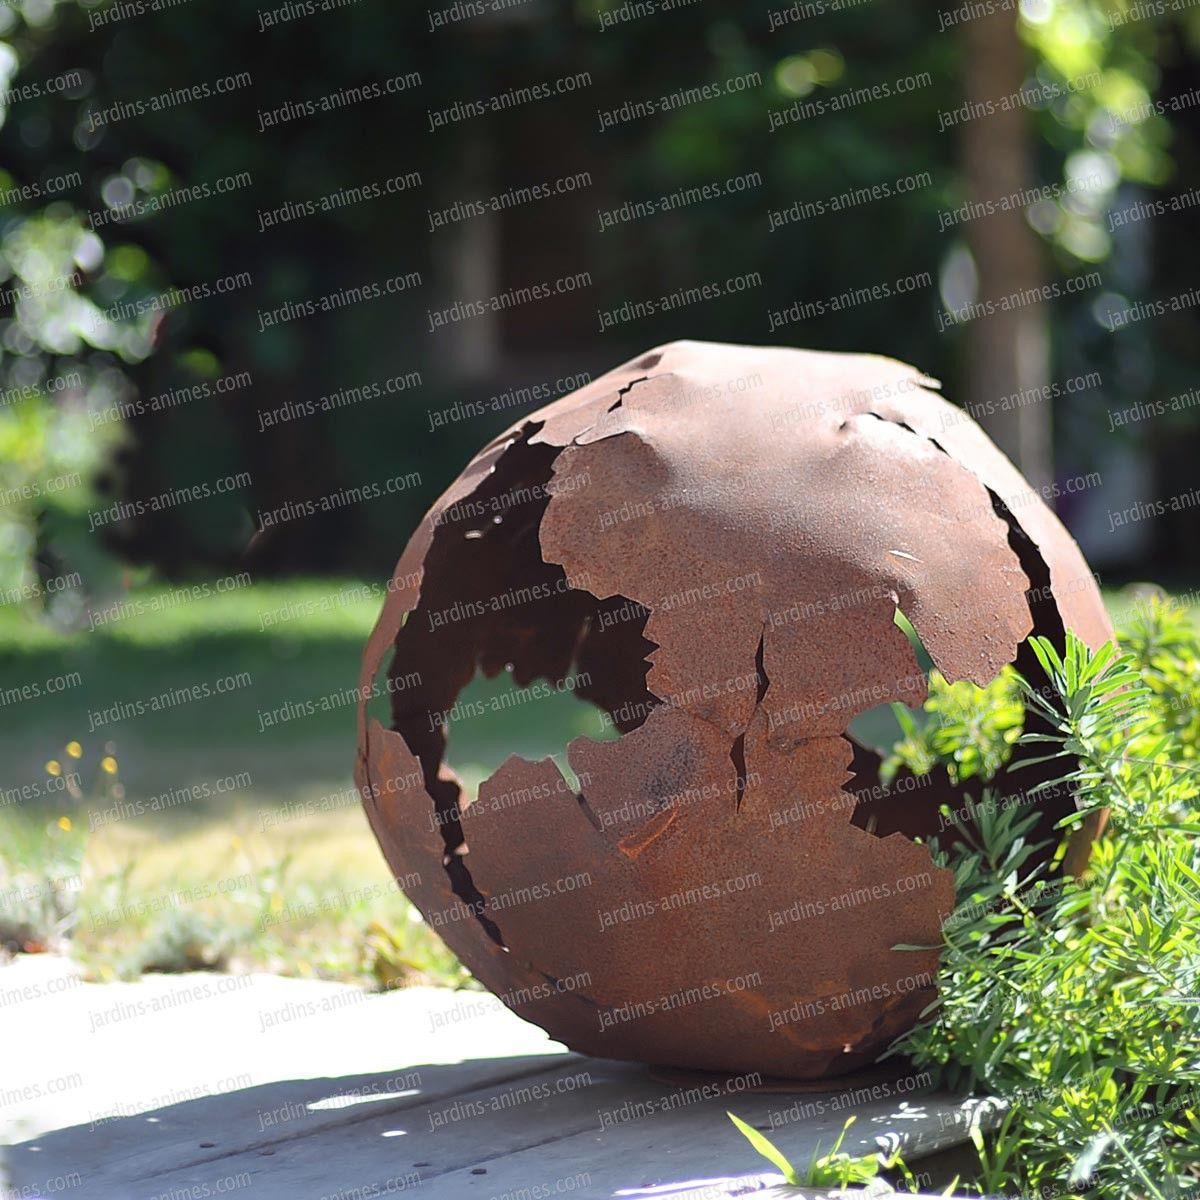 Acier Corten Quintessence Decoration De Jardin En Metal Rouille